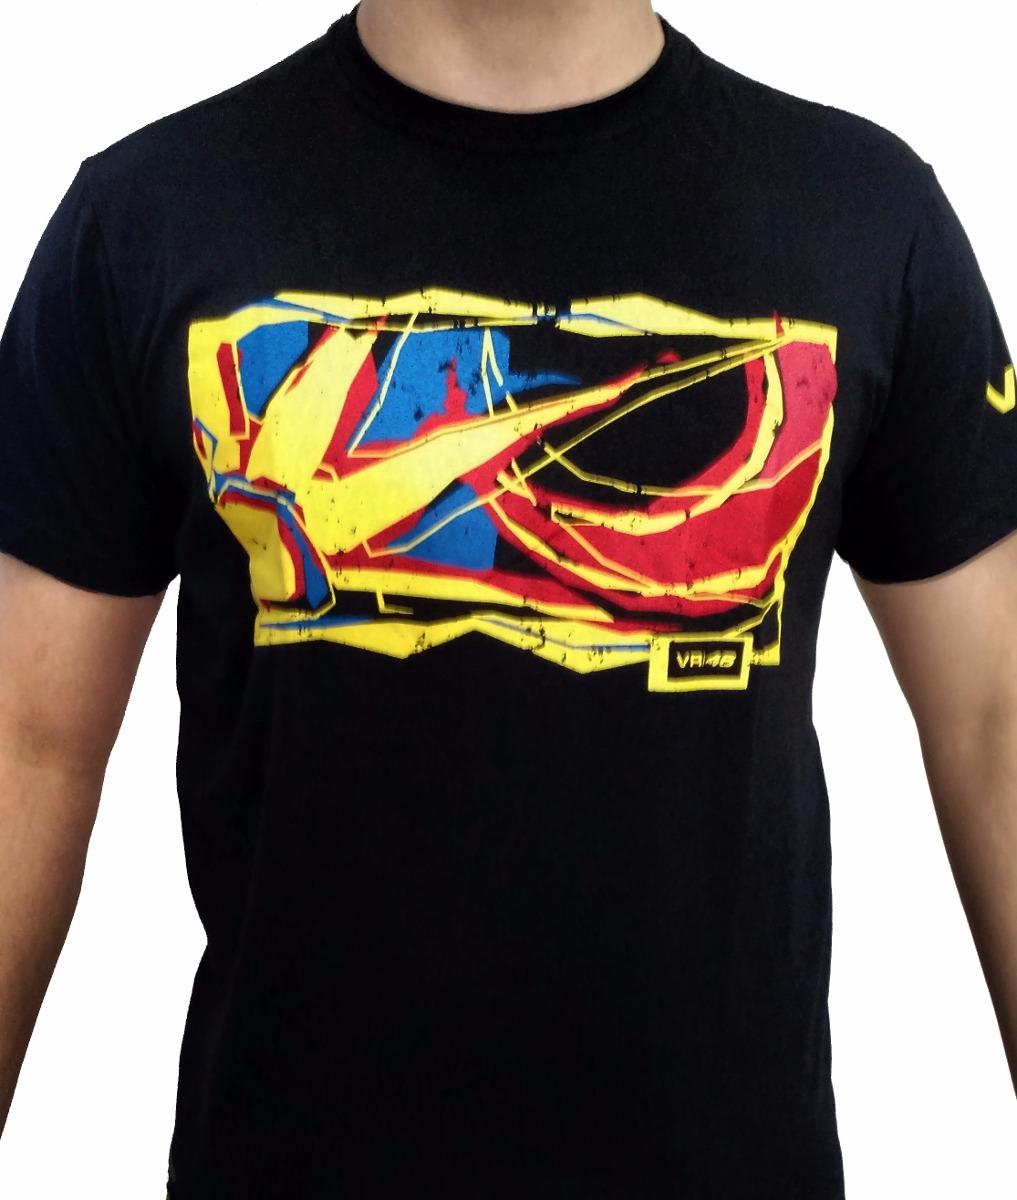 ba1ee2a89 Camiseta Valentino Rossi The Doctor Vr 46 Moto Gp Sol lua - R  70